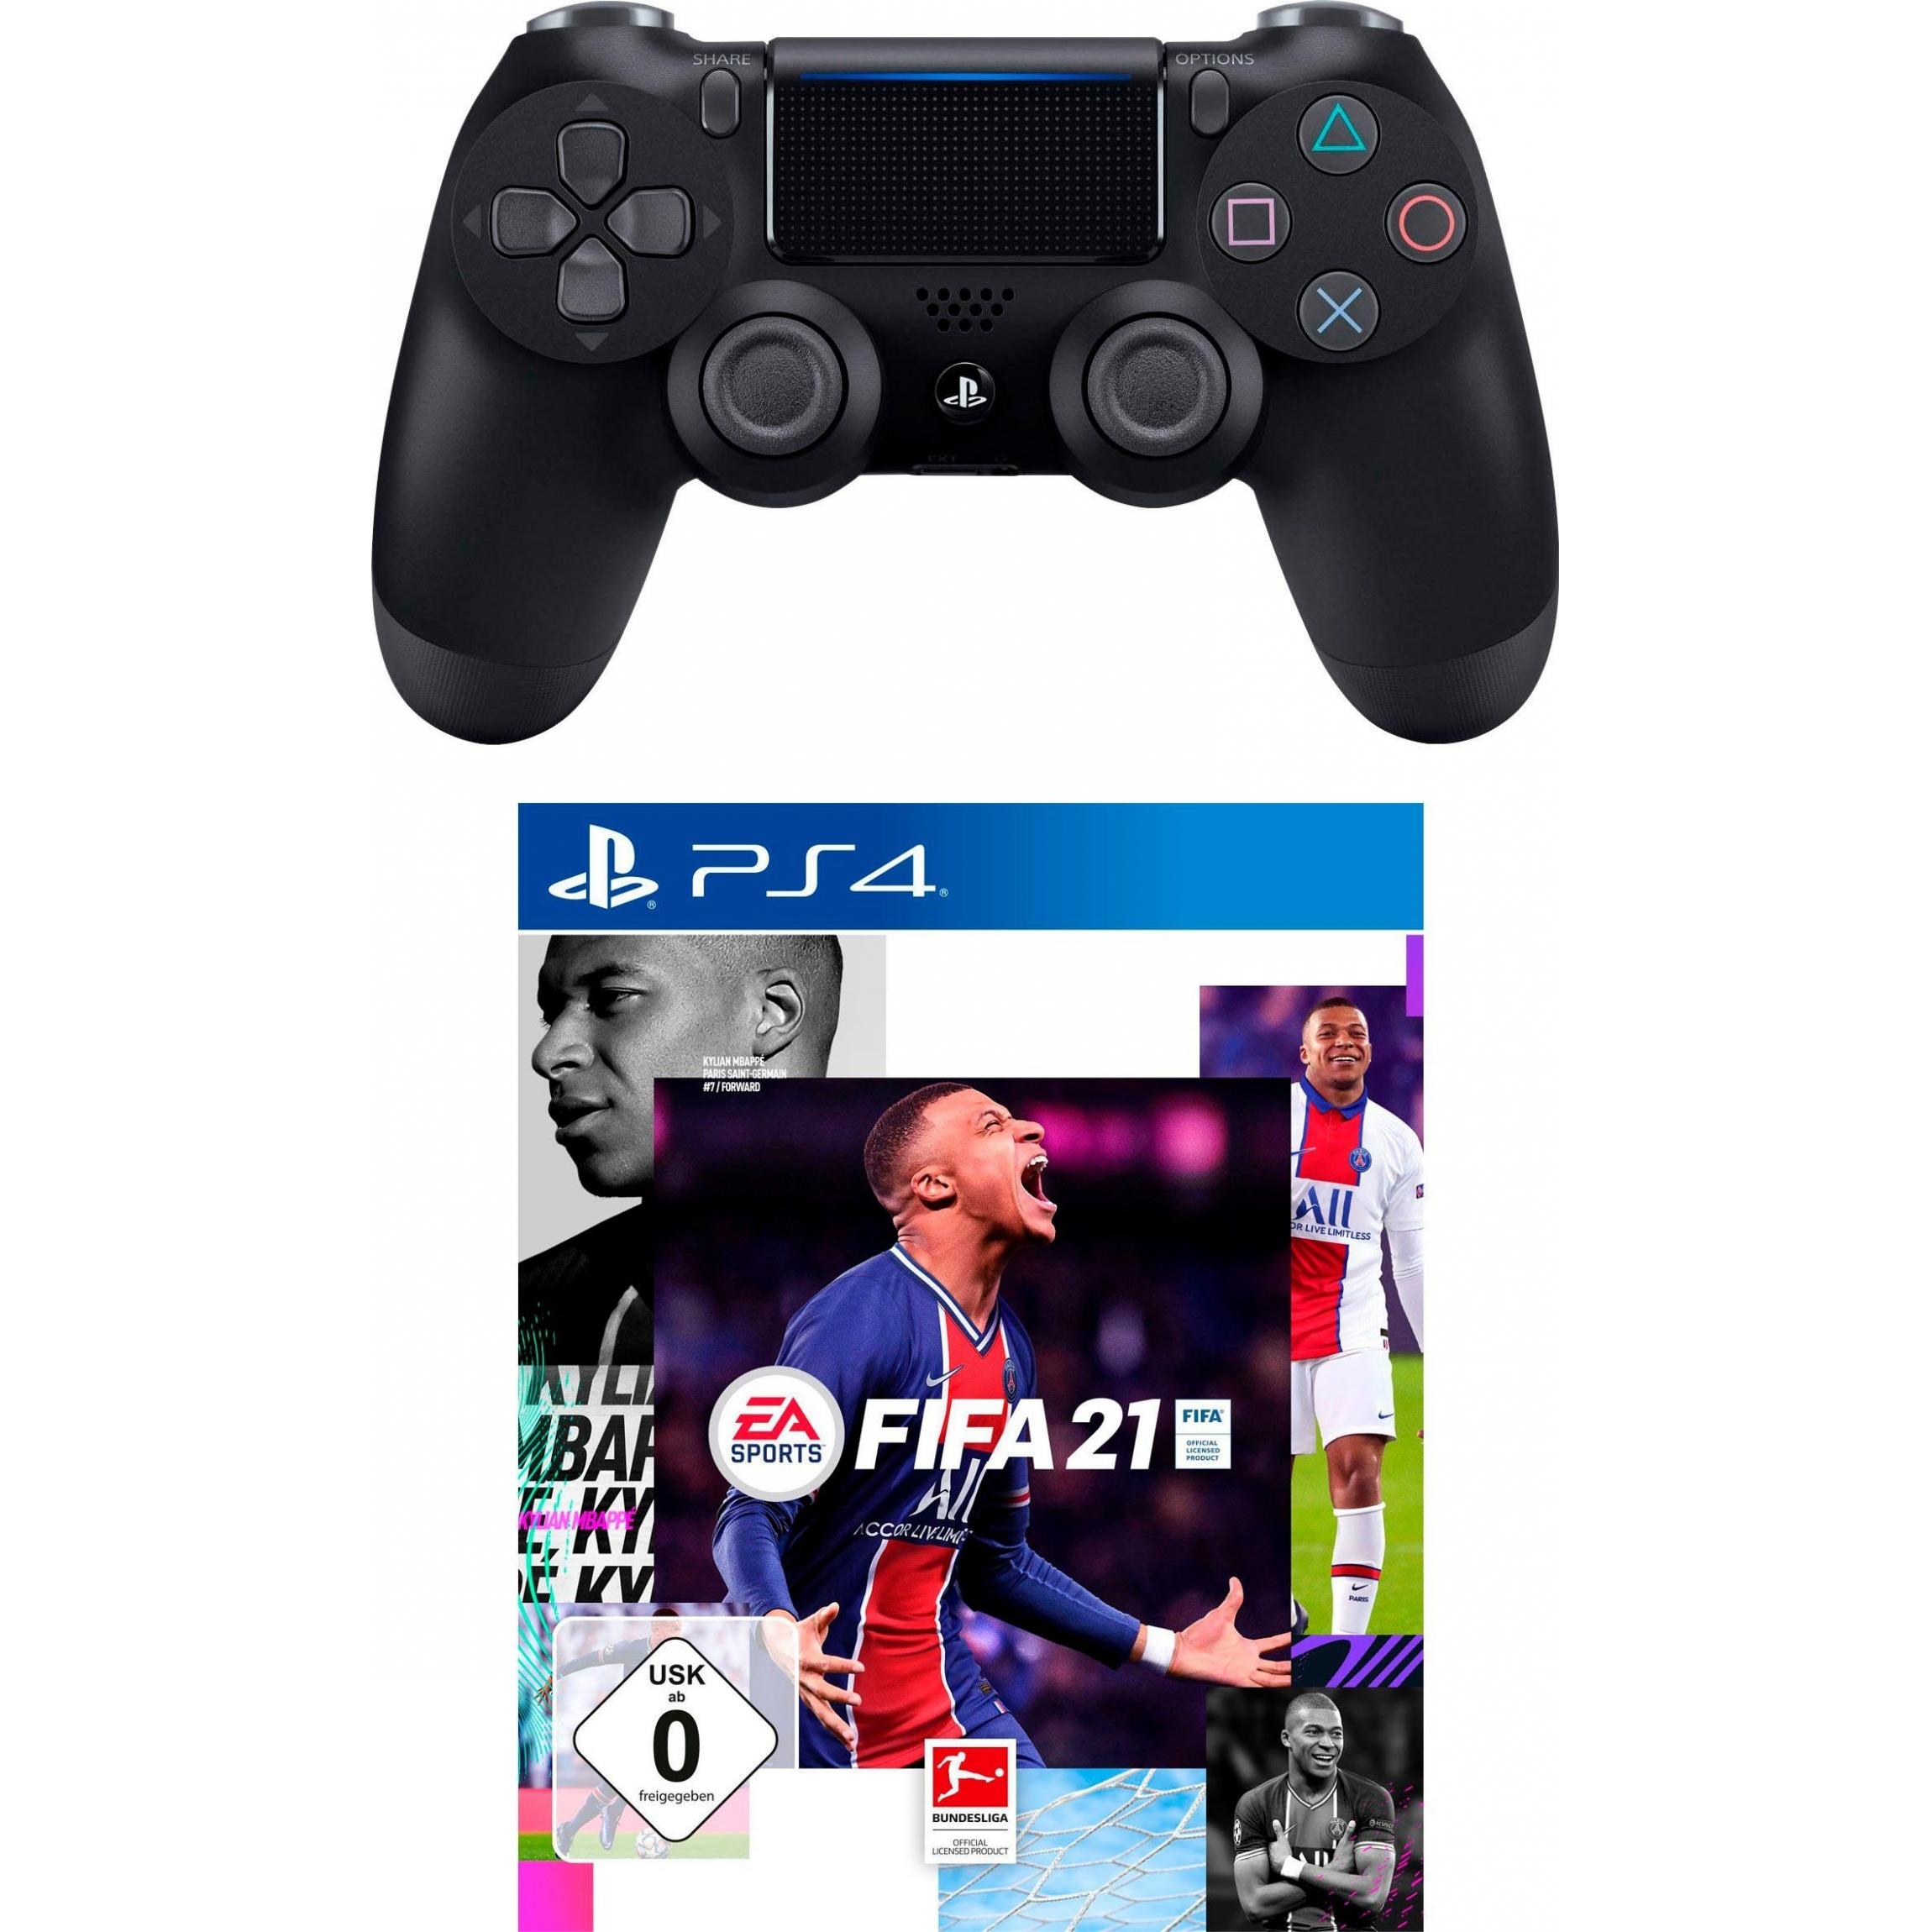 Sony ps4 DUALSHOCK 4 controller FIFA 21 (voucher) Bundle ...